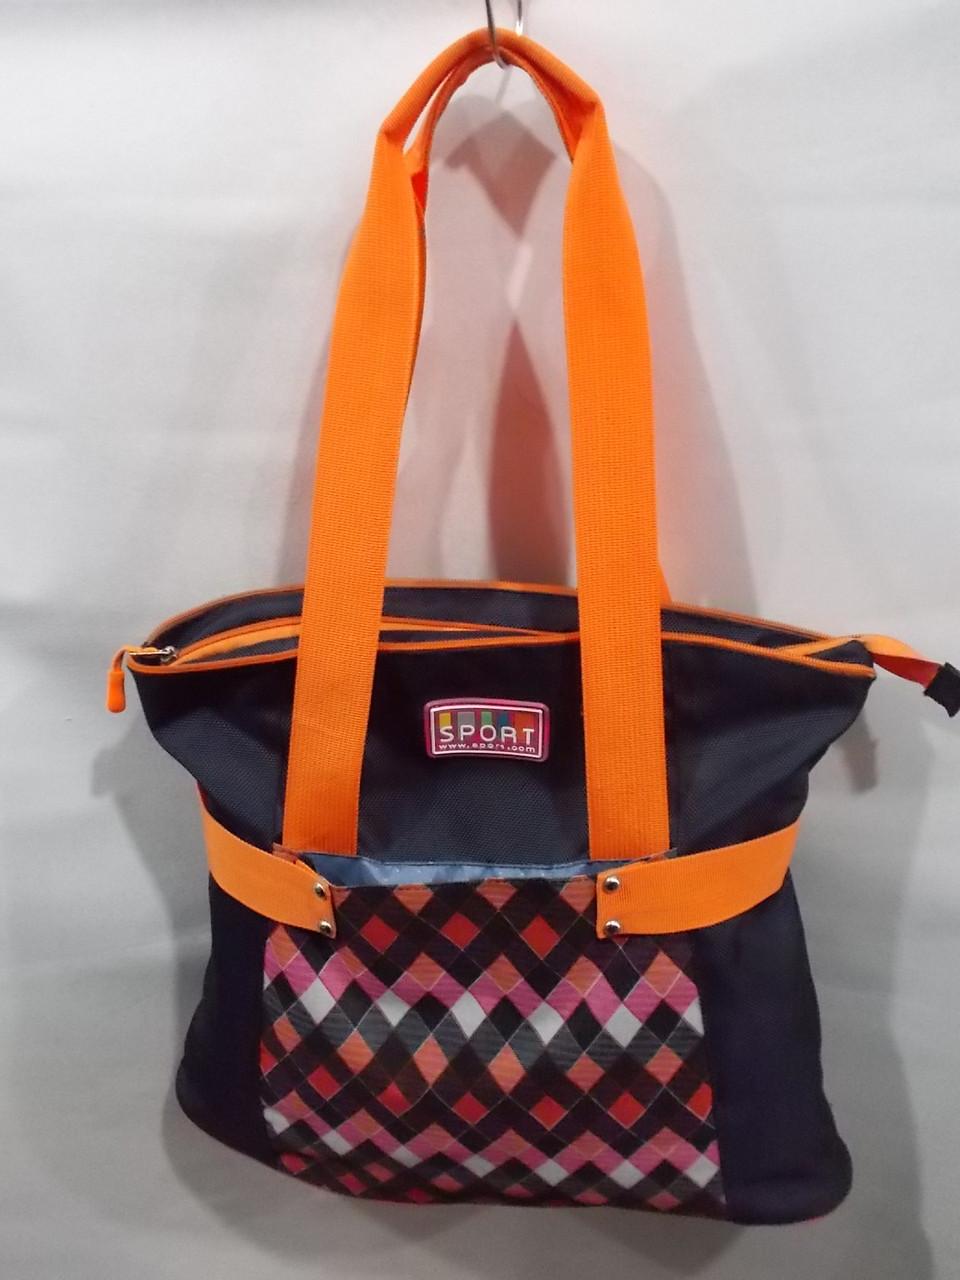 8e53e2f22f97 Купить Женскую спортивную сумку серии Fashion оптом недорого в ...